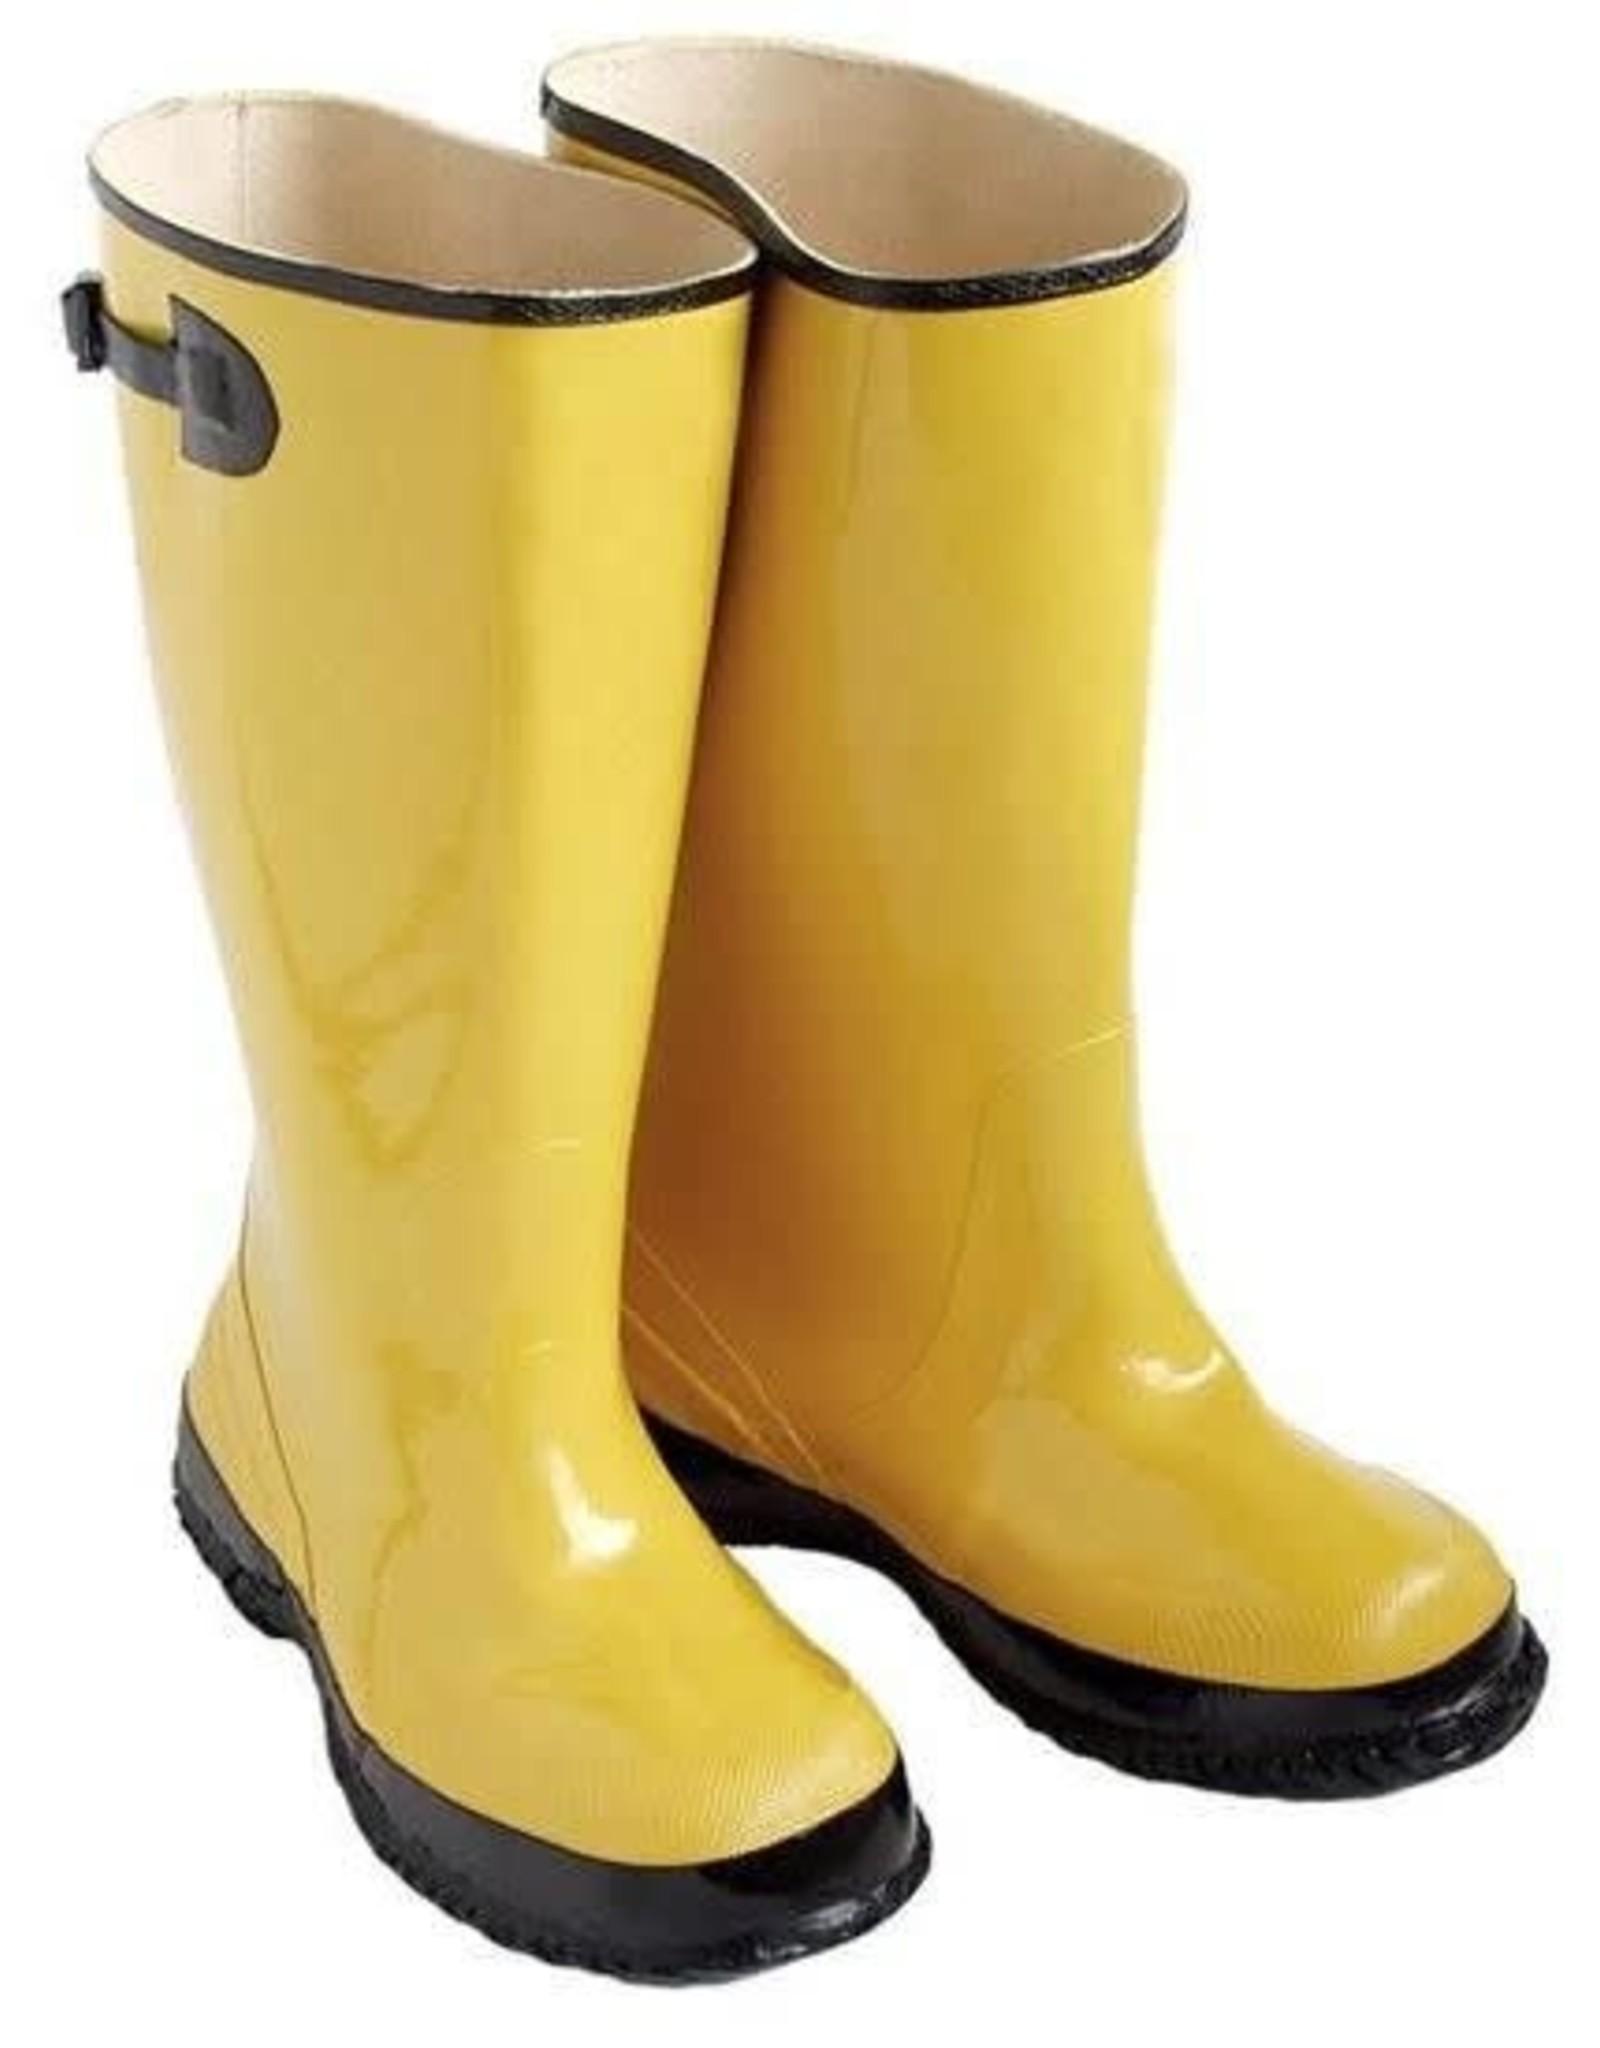 Seattle Boots, Yellow w/Fabric Lining, SZ. 11